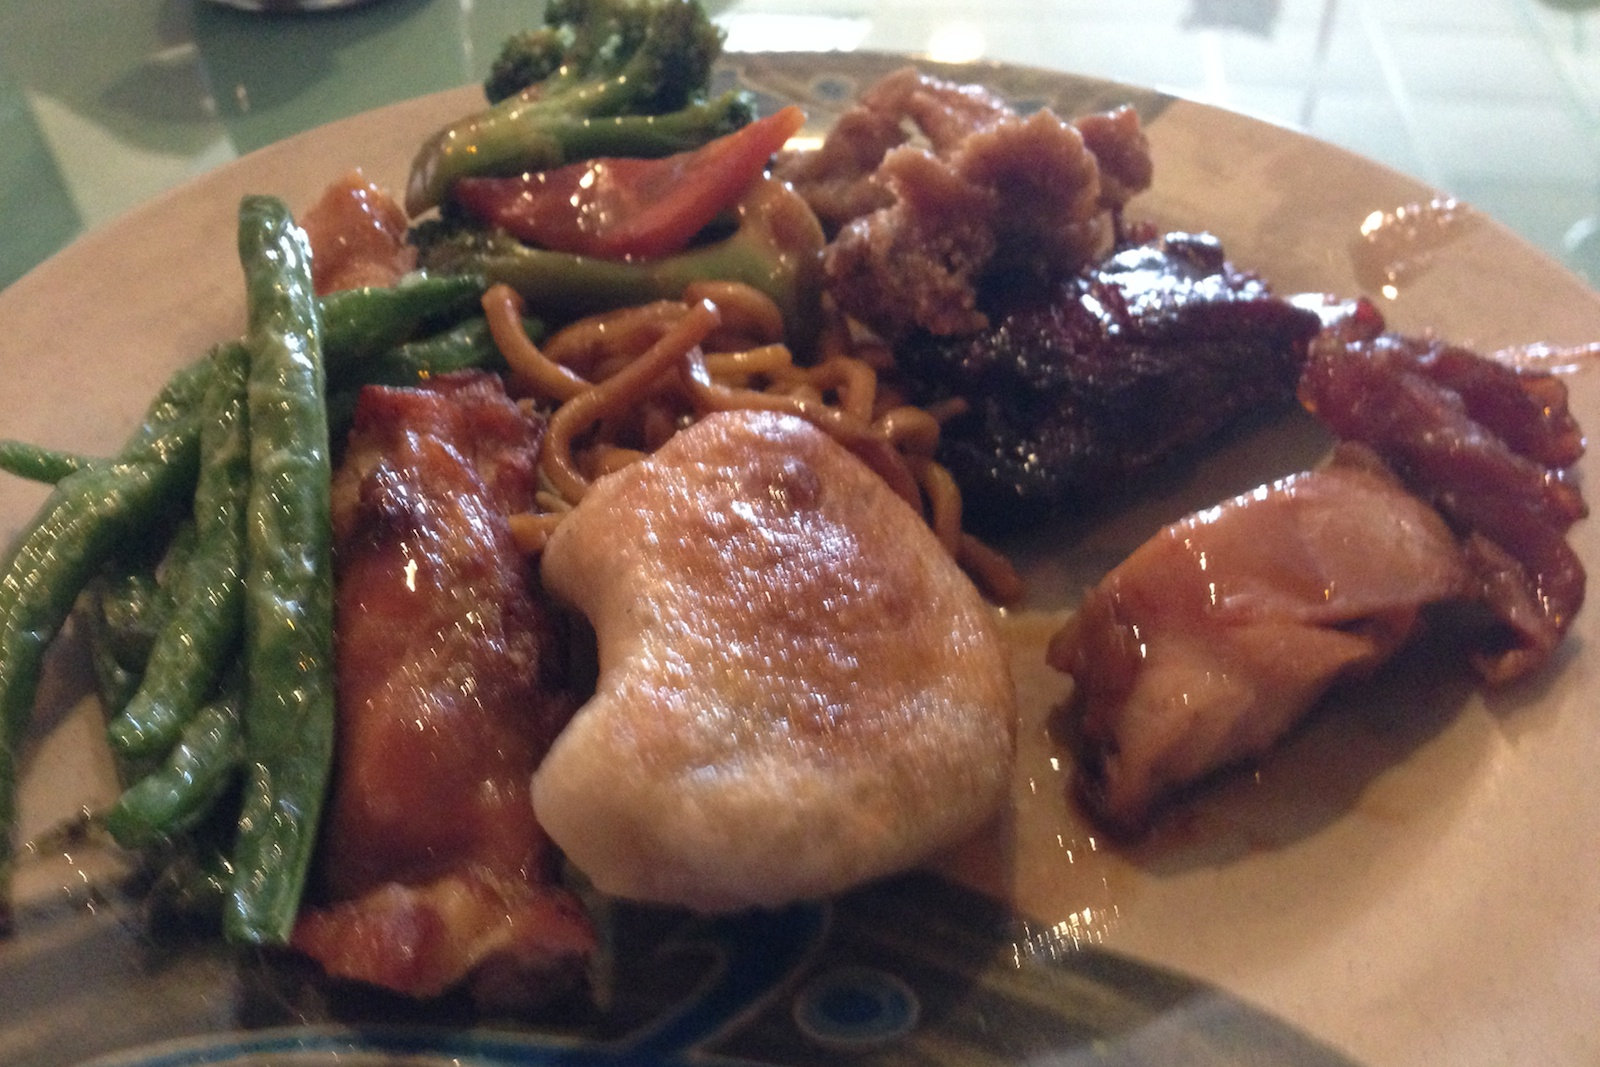 http://blog.rickk.com/food/2014/07/27/ate.2014.07.27.d1.jpg